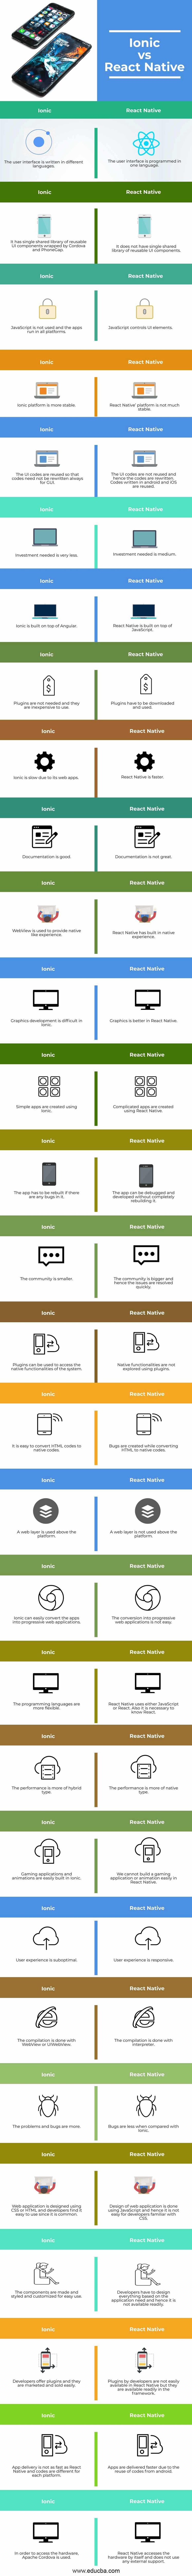 Ionic-vs-React-Native-info